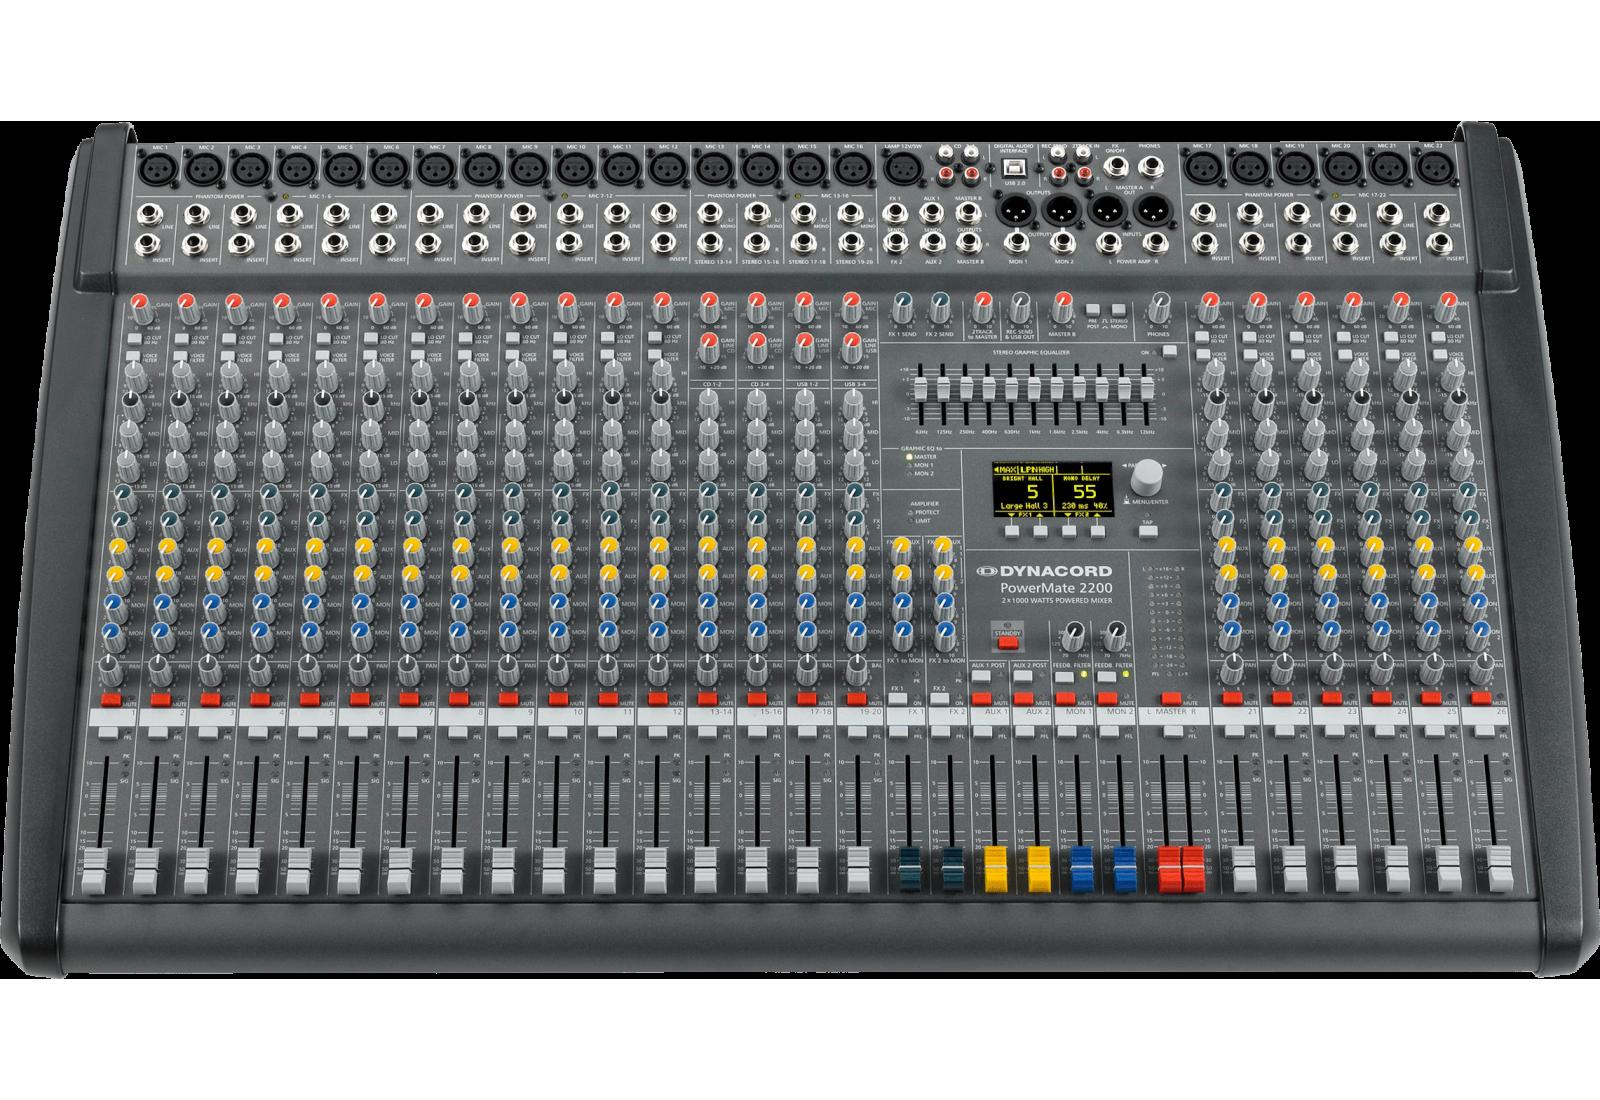 MIXER ANALOG DYNACORD POWERMATE 2200-3